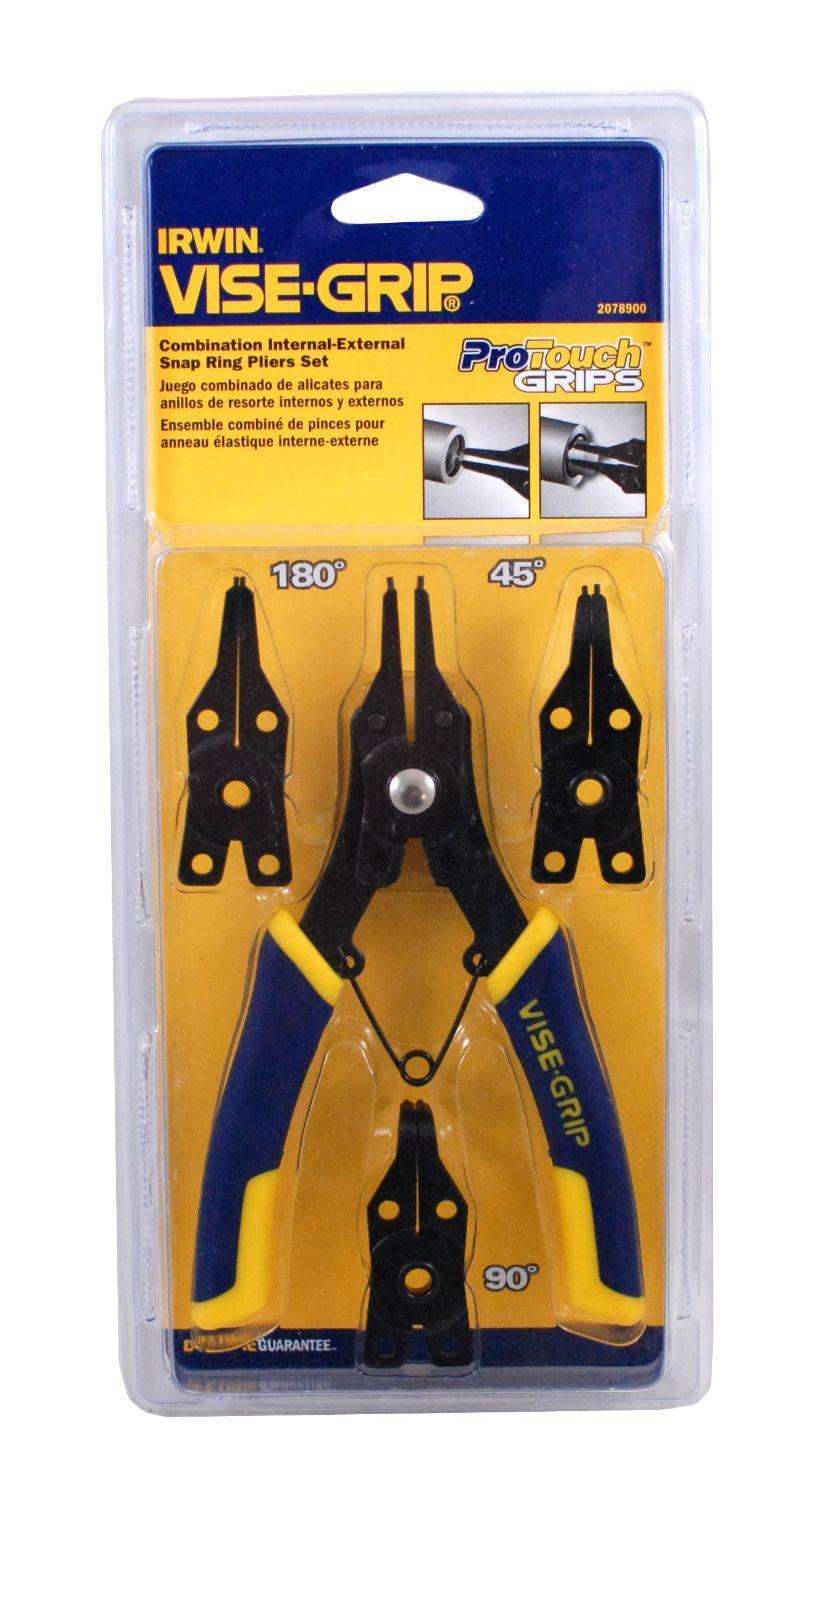 Irwin vise grip convertible snap ring pliers 2078900 ebay for Irwin motors body shop